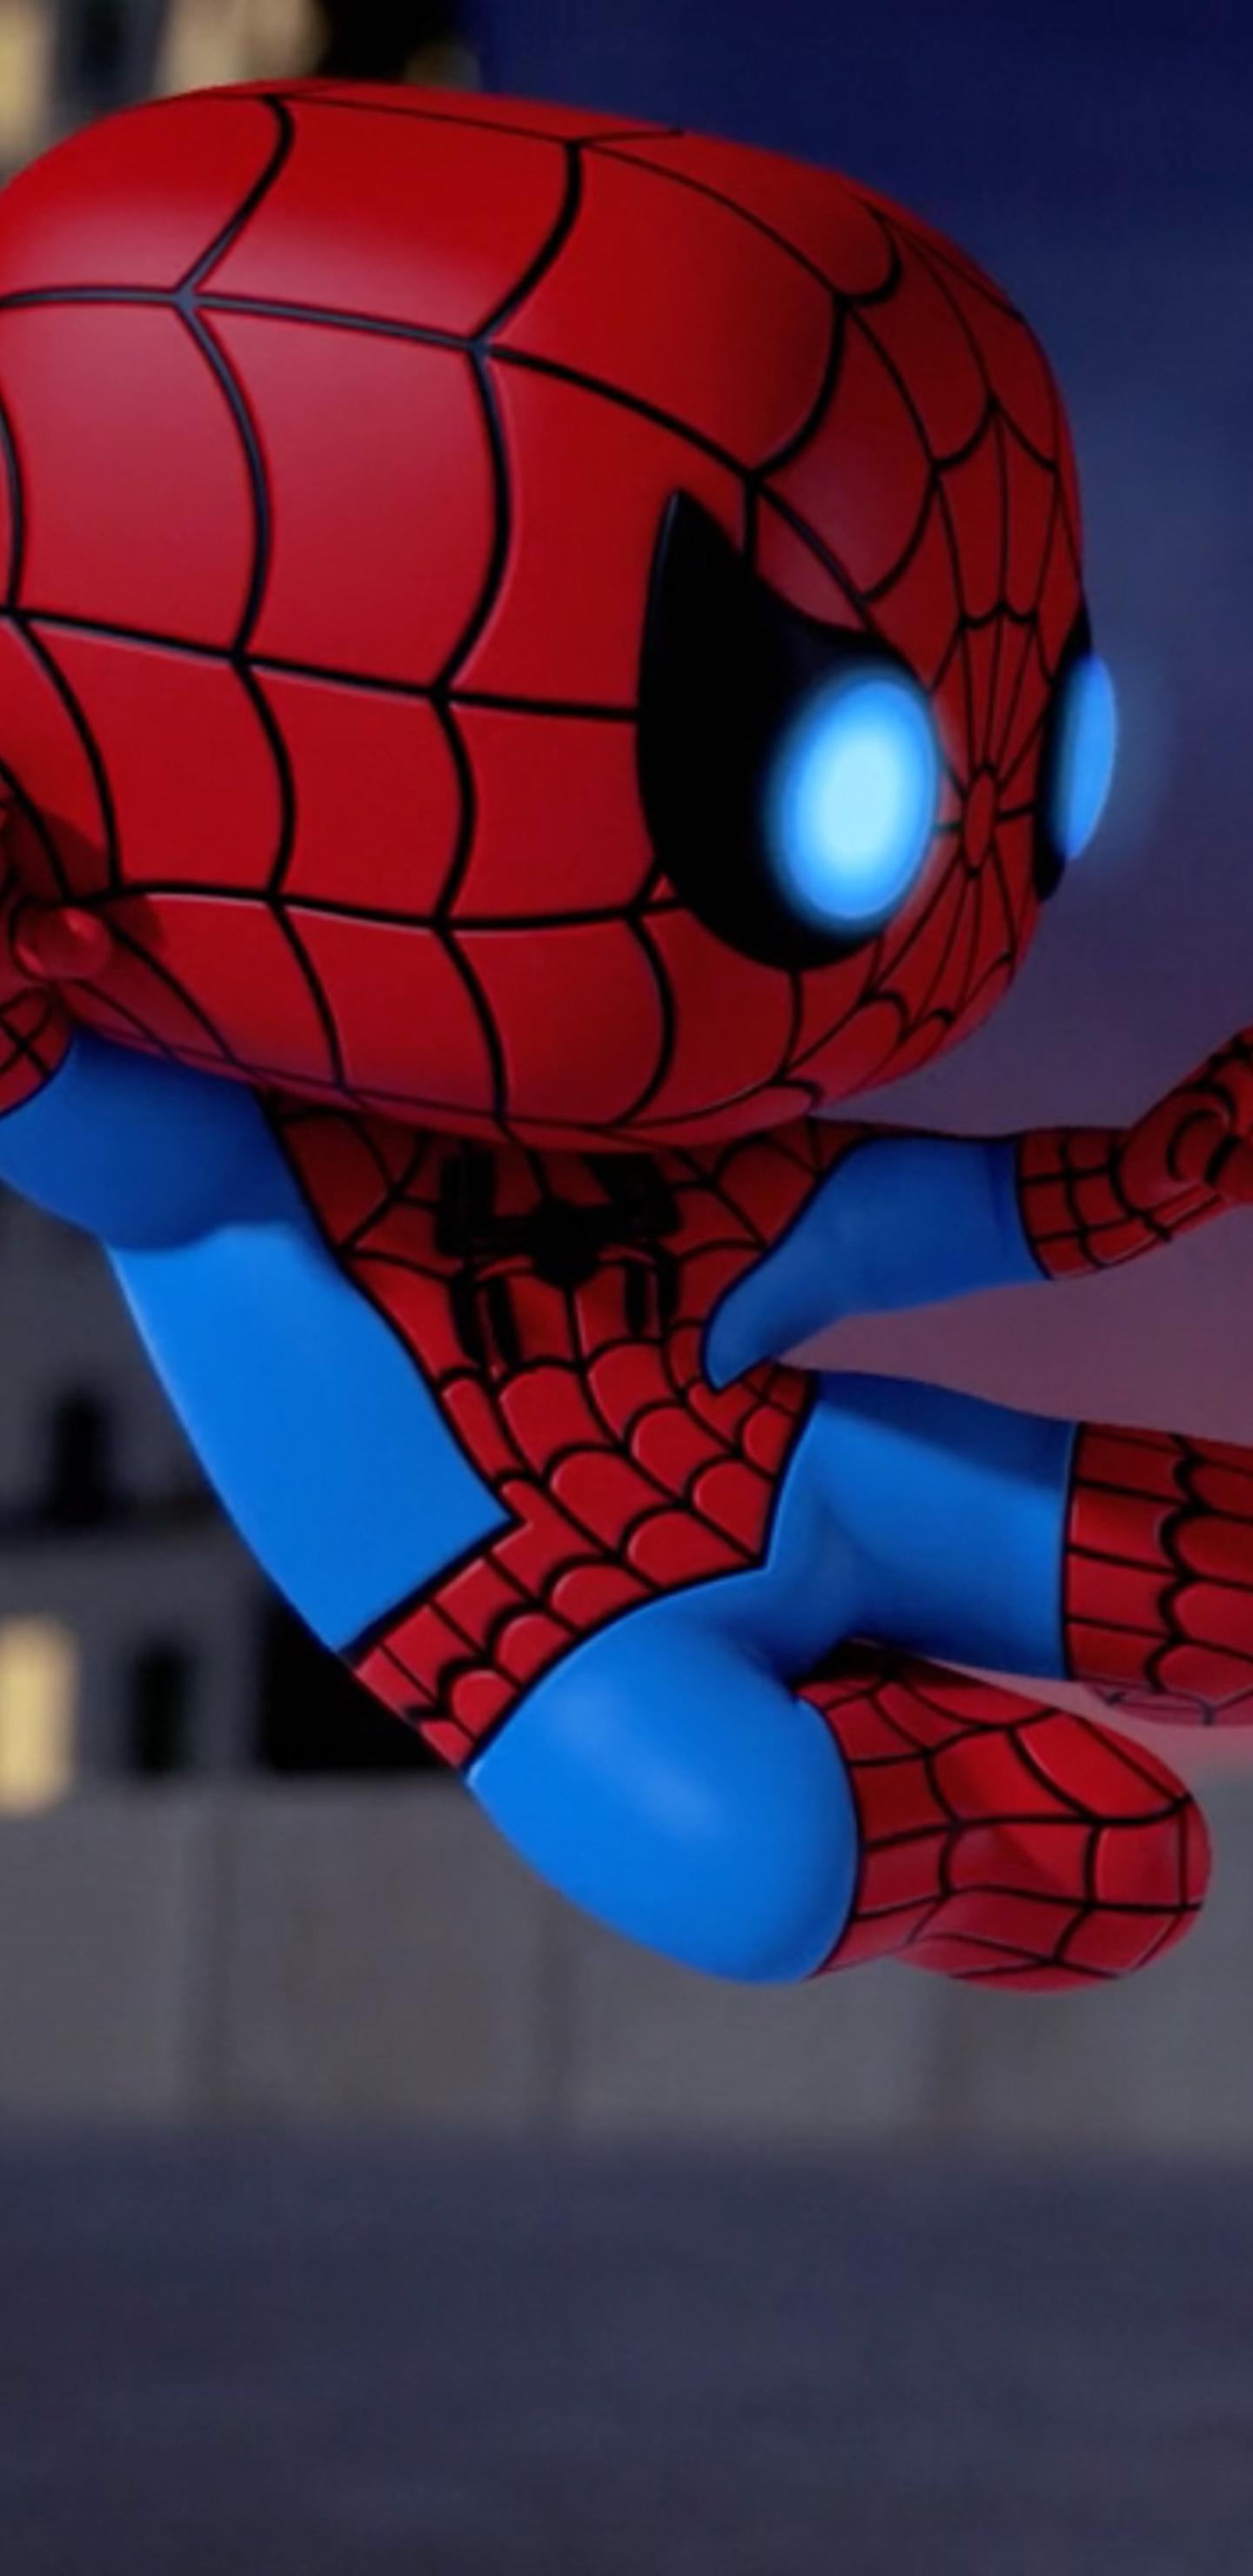 1440x2960 Iron Man Vs Spiderman Spellbound Animated Movie